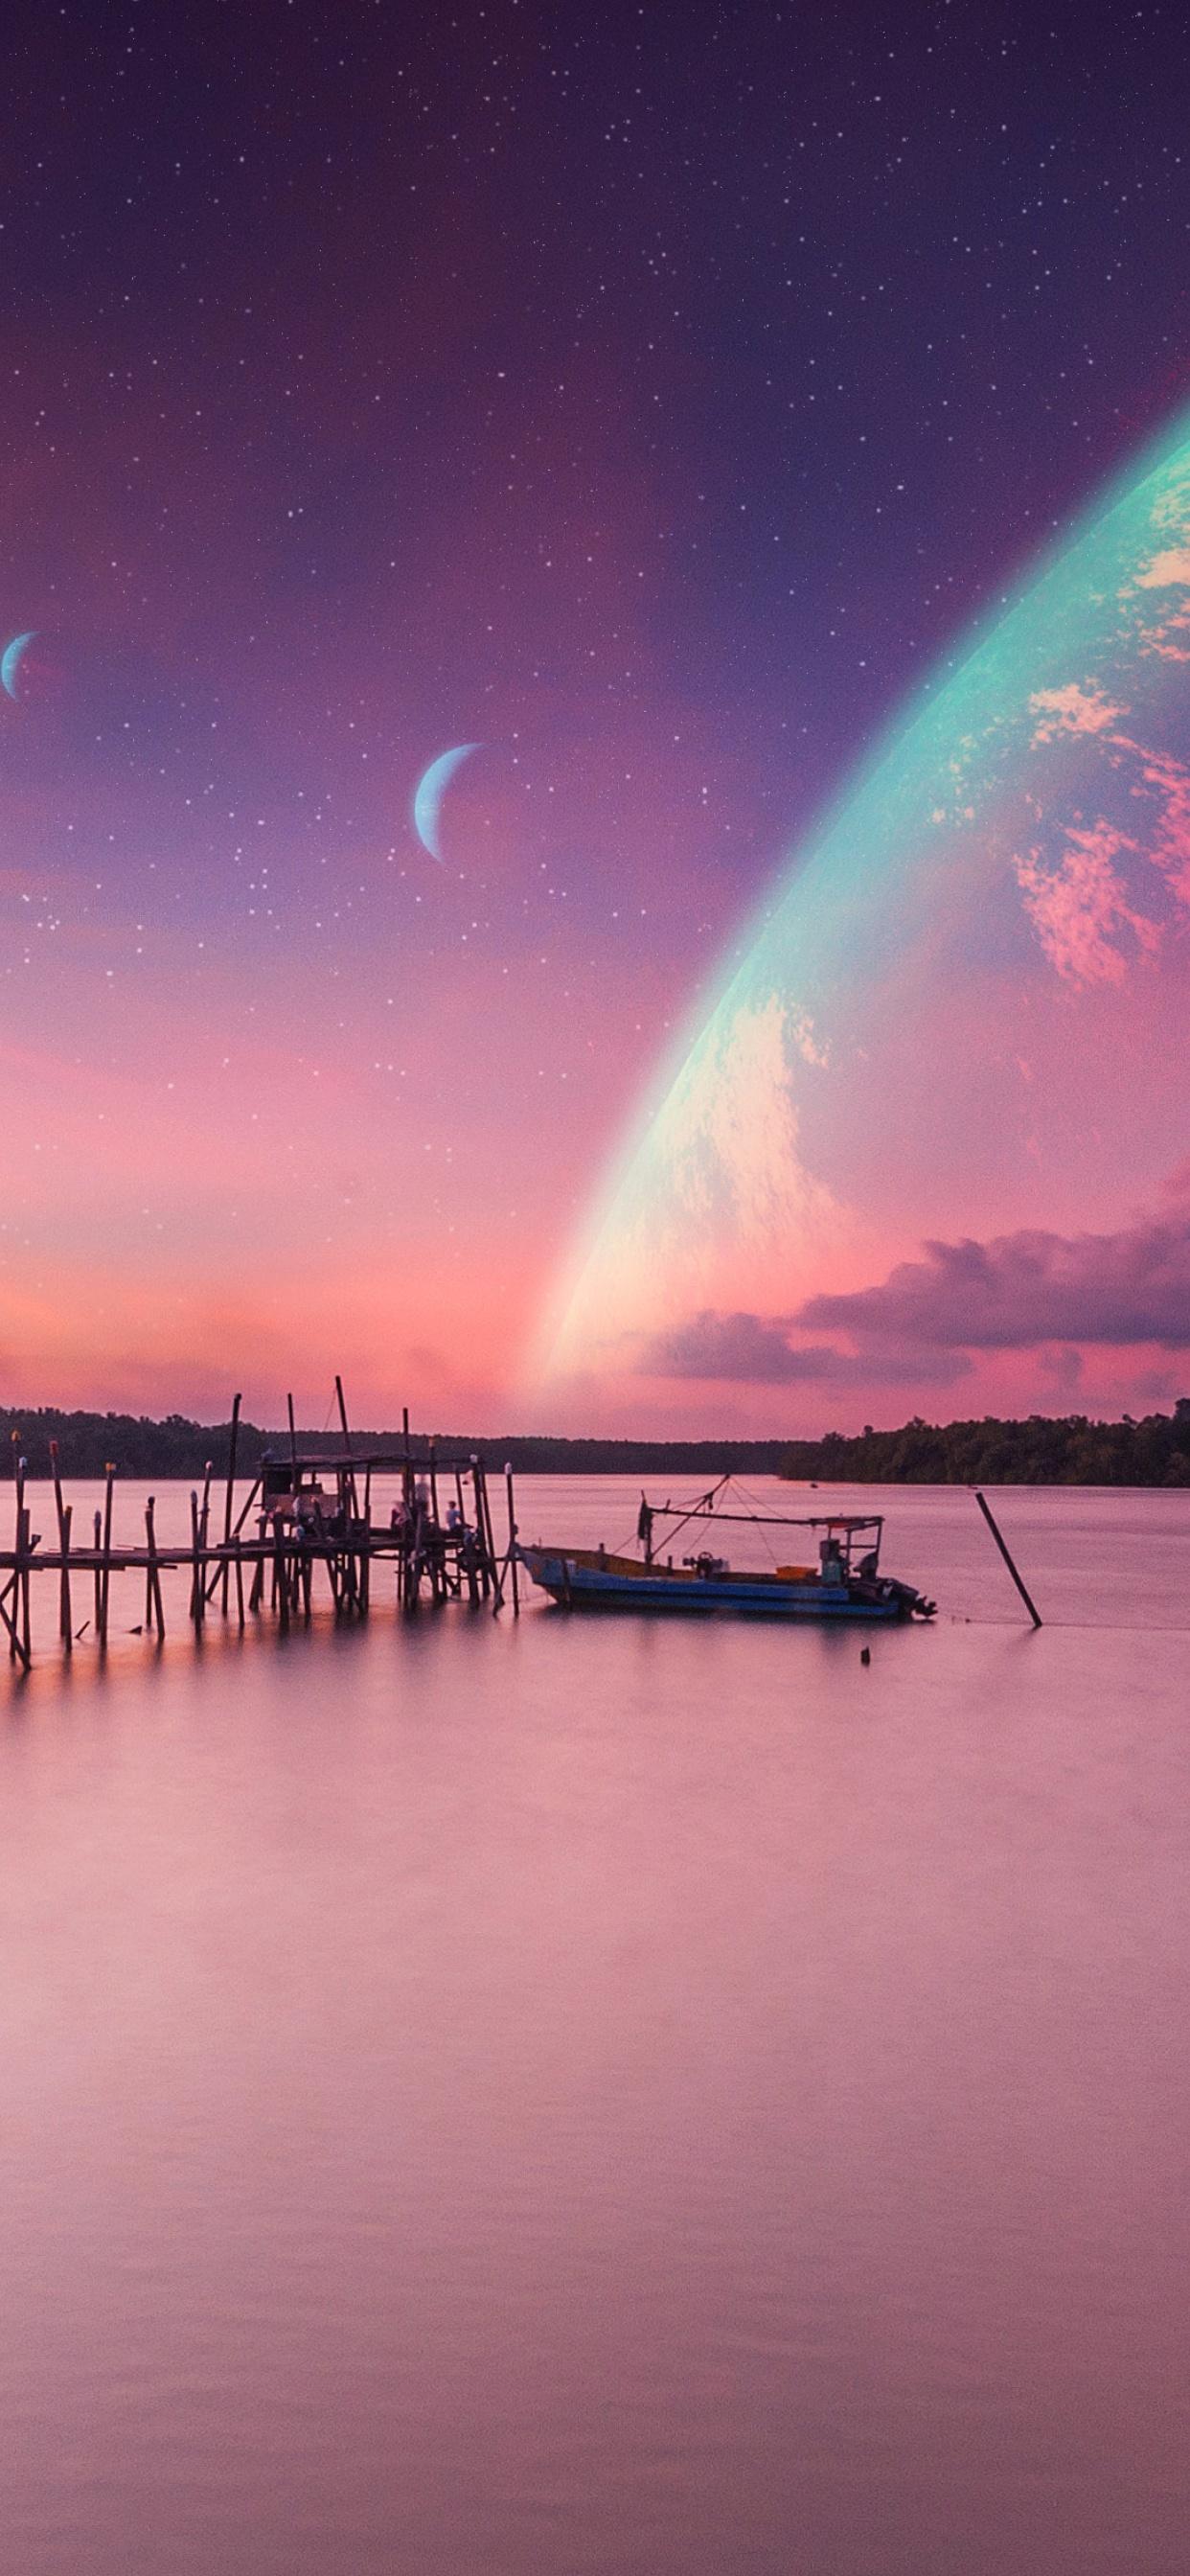 Dawn 4k Wallpaper Landscape Sunset Planets Peaceful Calm Surreal Nature 1153